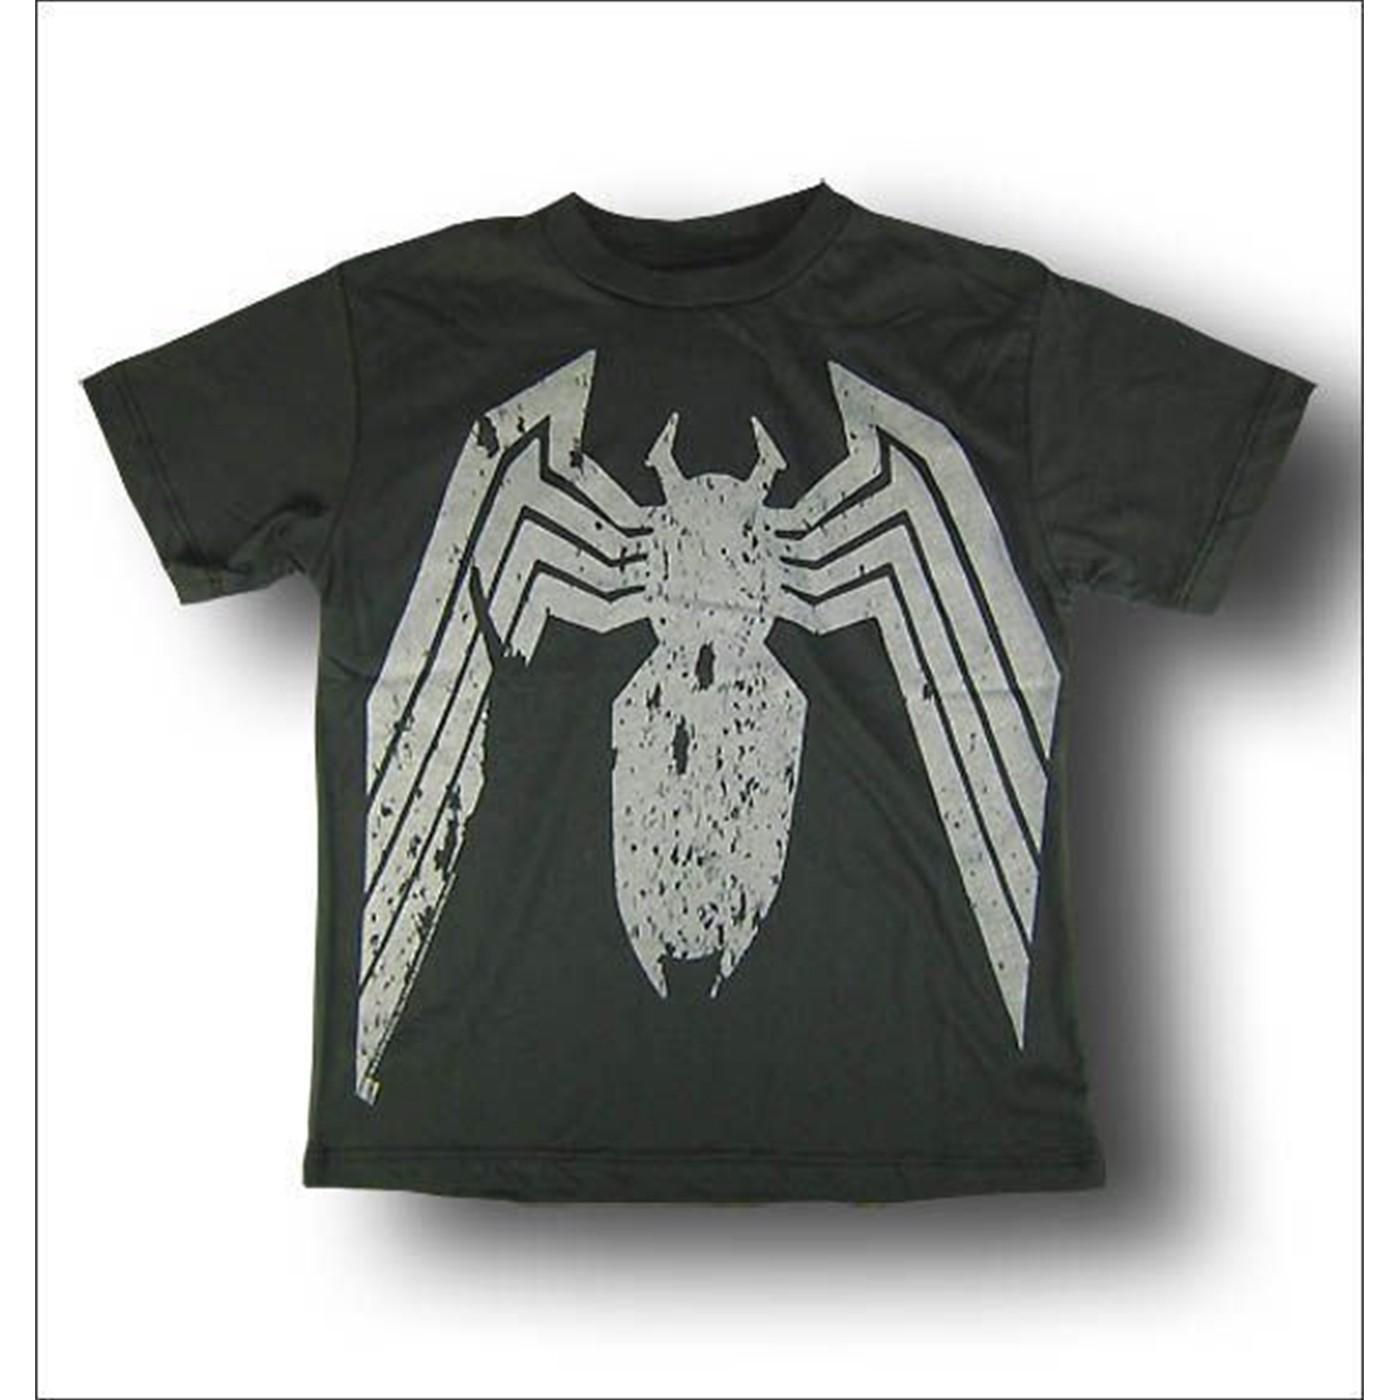 Evil Spiderman Juvenile Black Wash T-Shirt by Junk Food